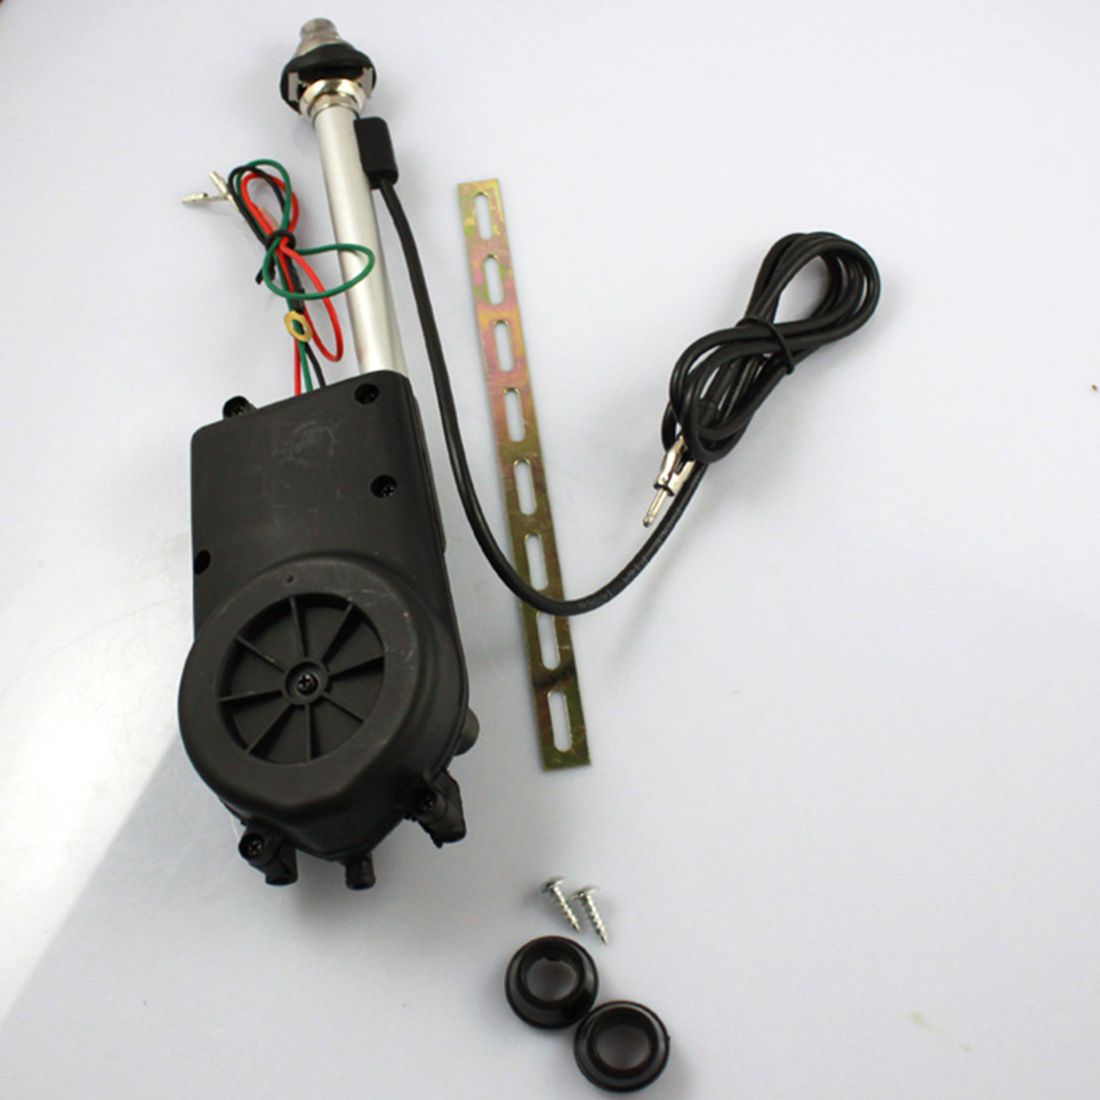 hight resolution of marsnaska universal car antenna electric power antenna replacement kit vehicle am fm radio mast aerial car accessories